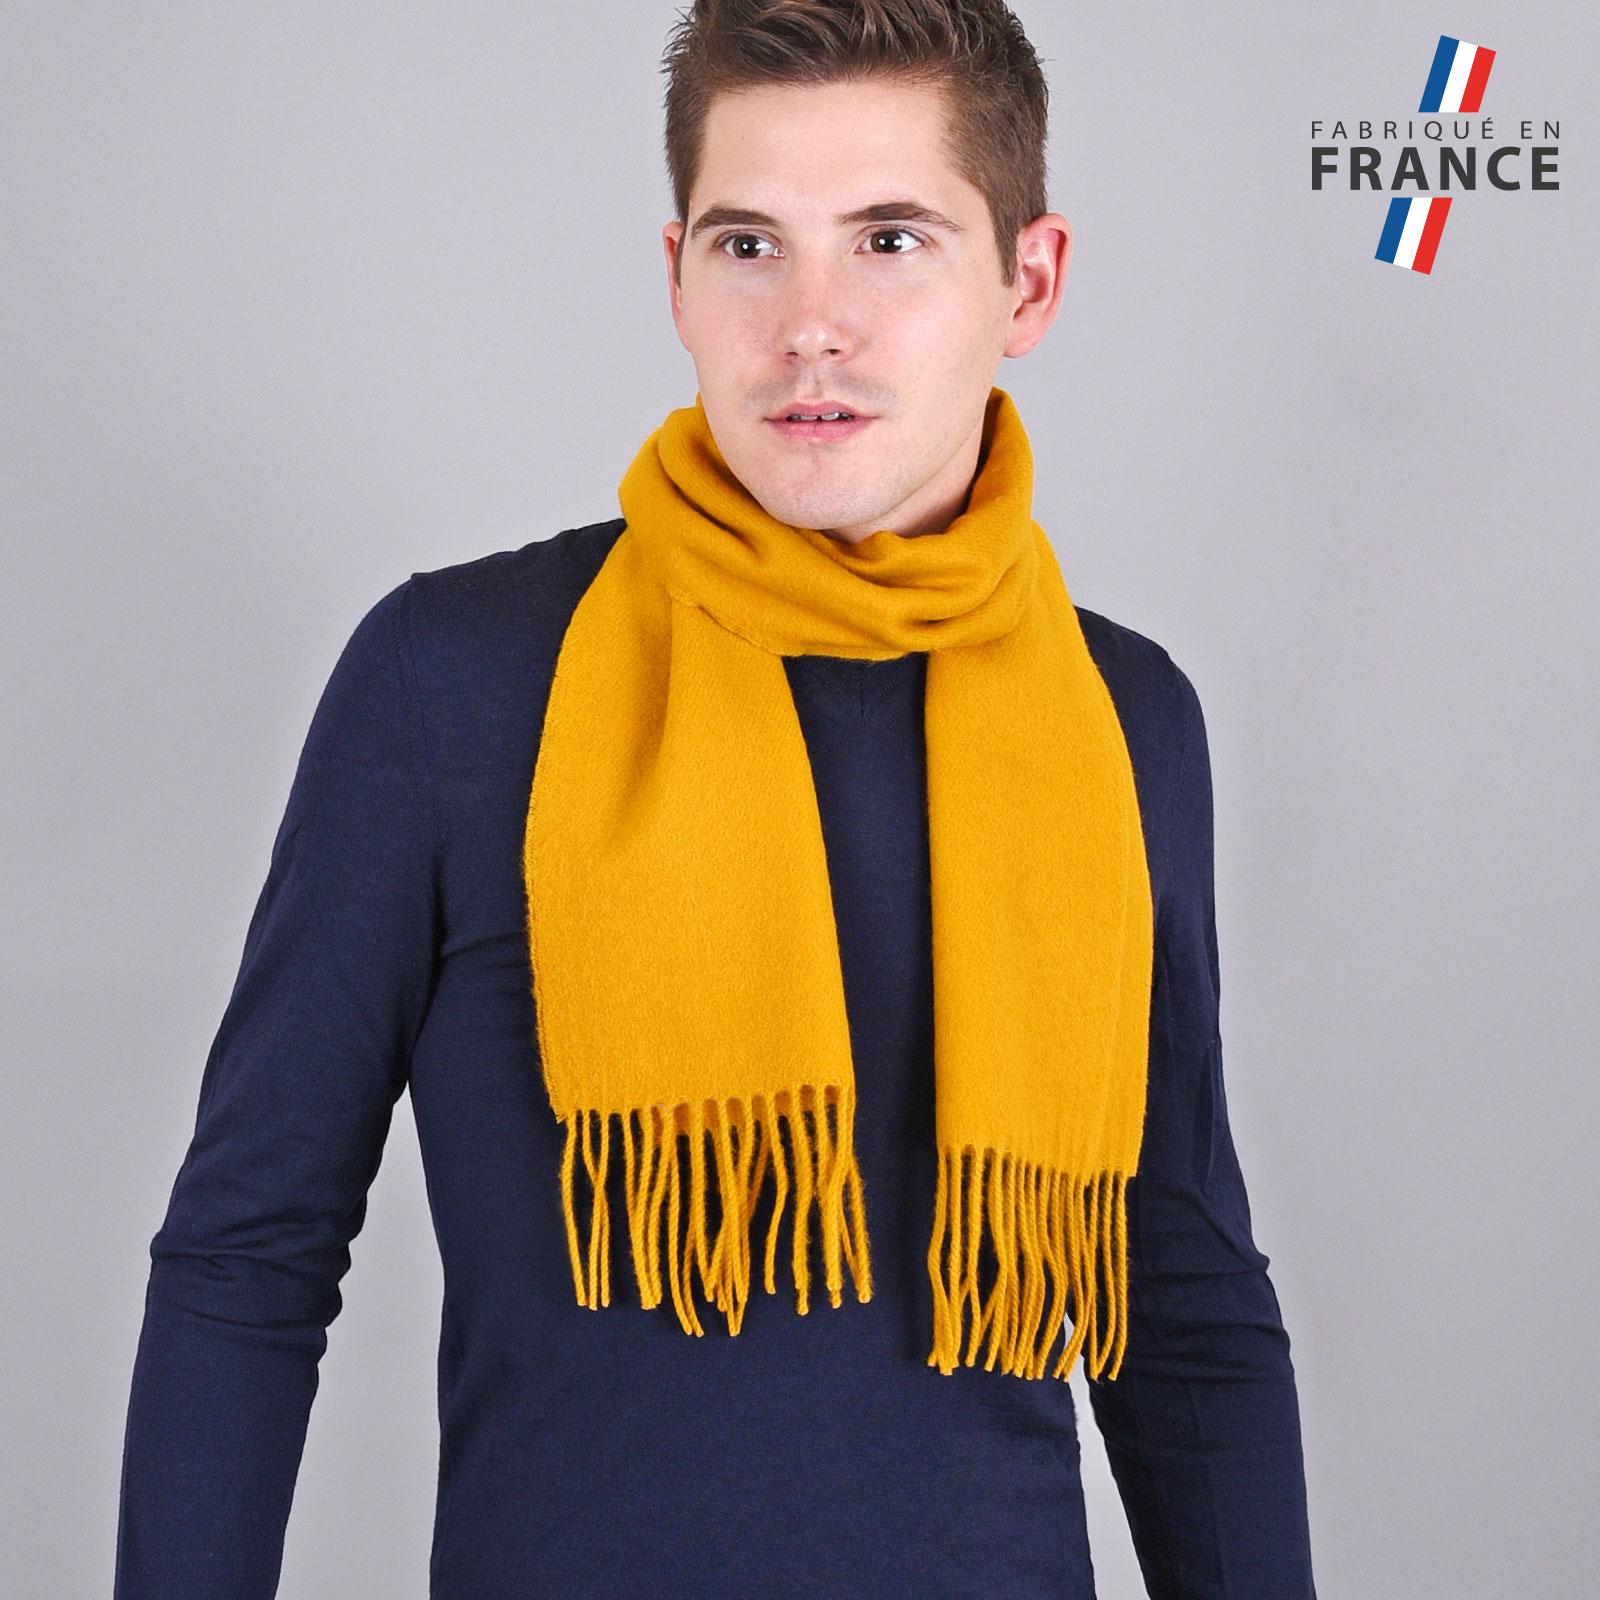 AT-03241-VH16-LB_FR-echarpe-homme-a-franges-moutarde-fabrication-francaise